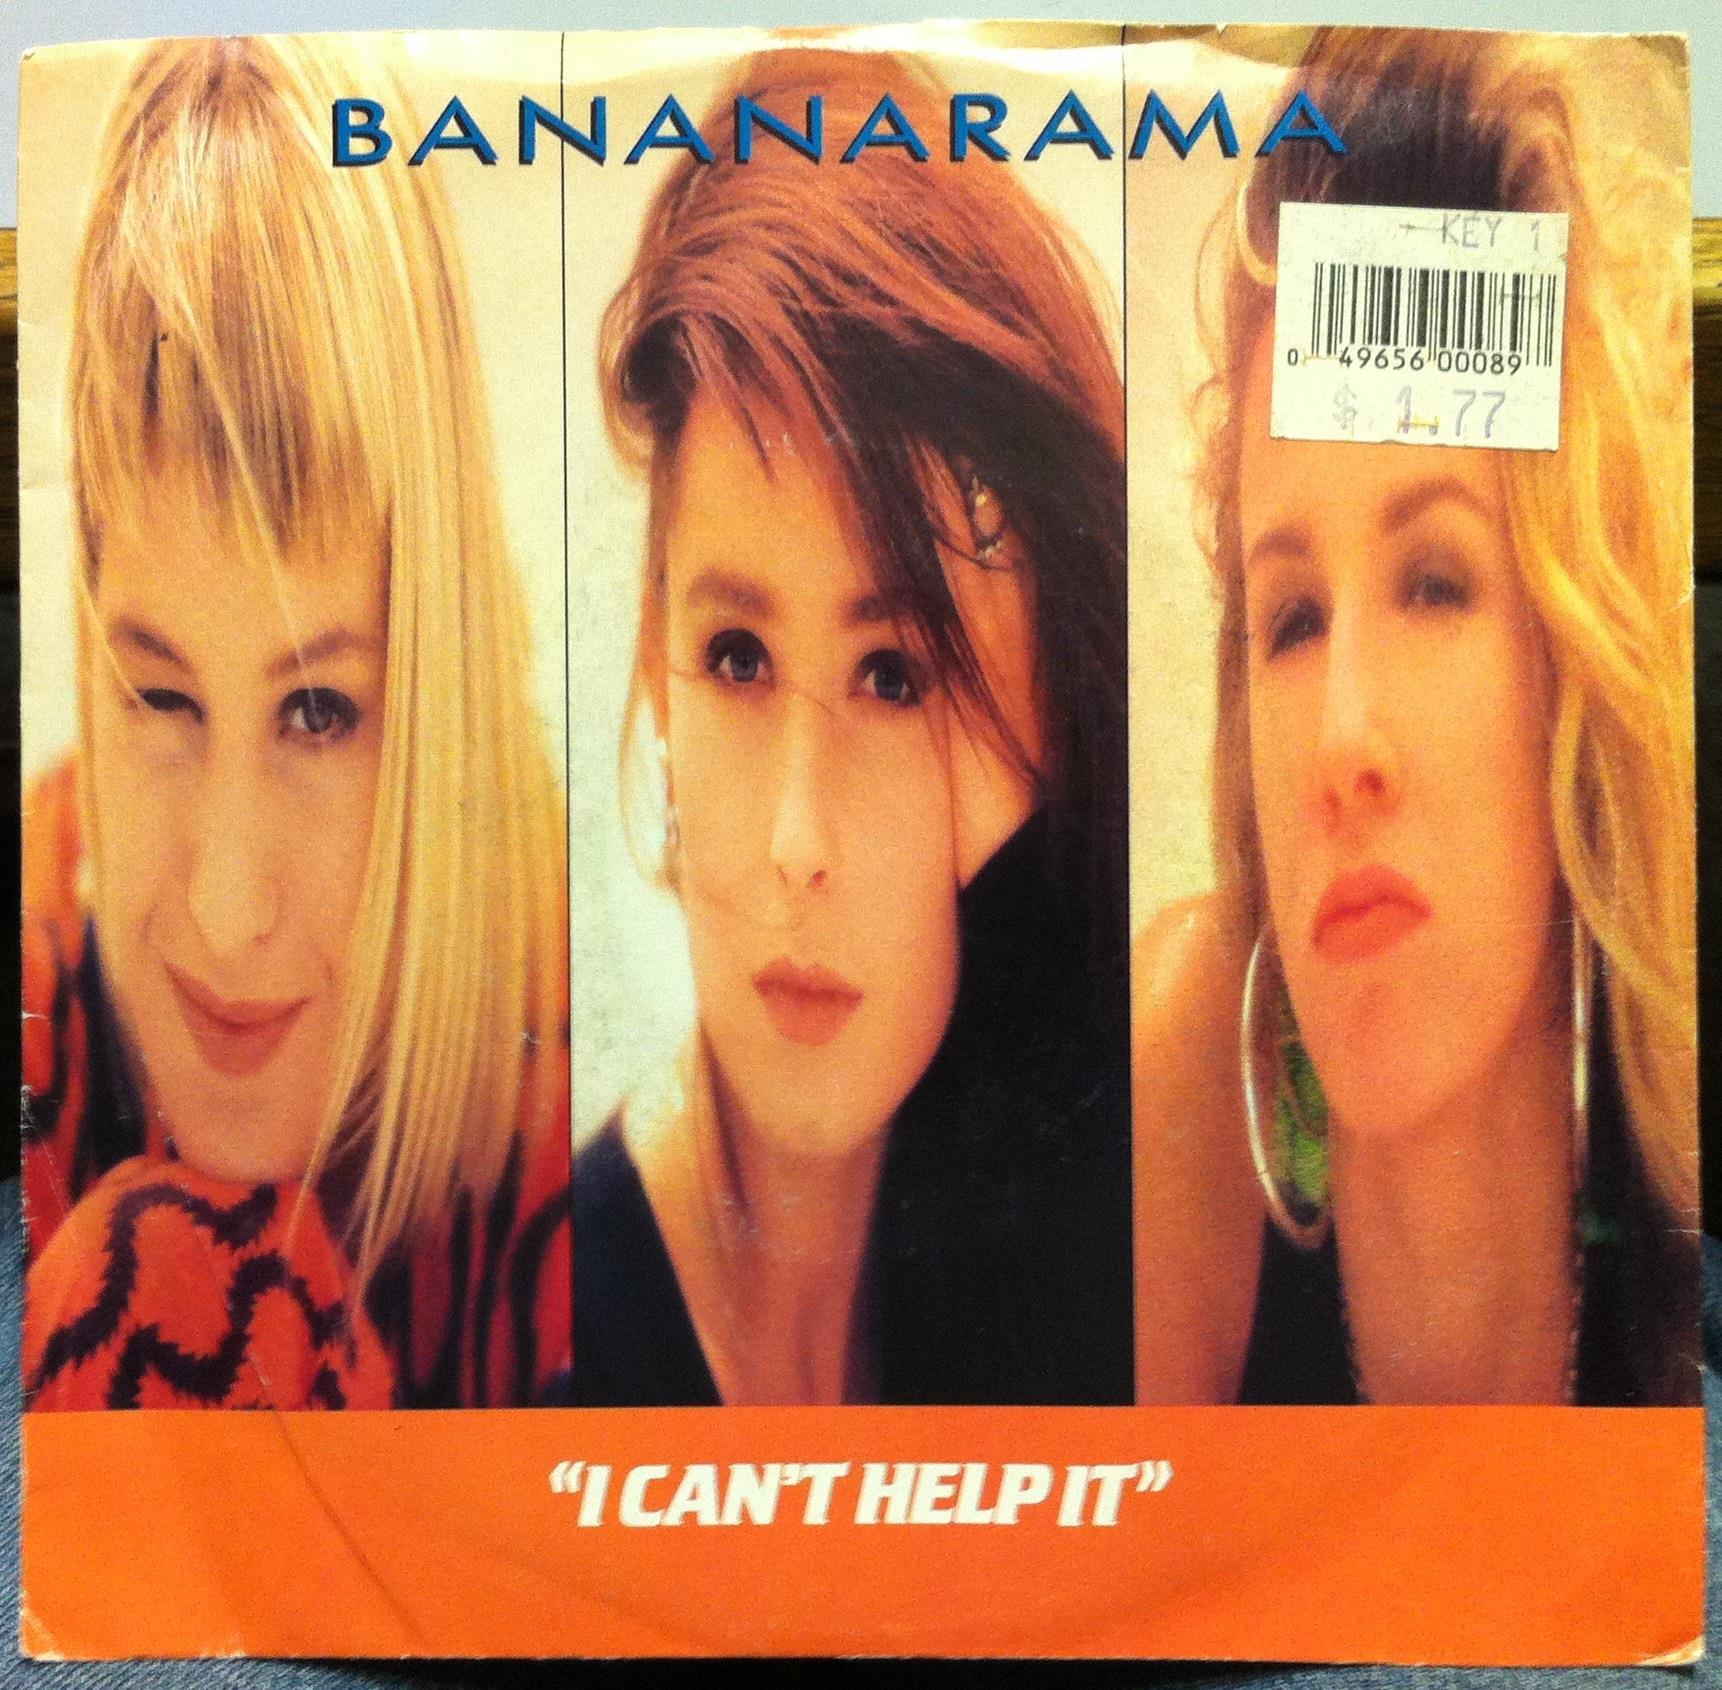 BANANARAMA - I Can't Help It / Mr Sleaze